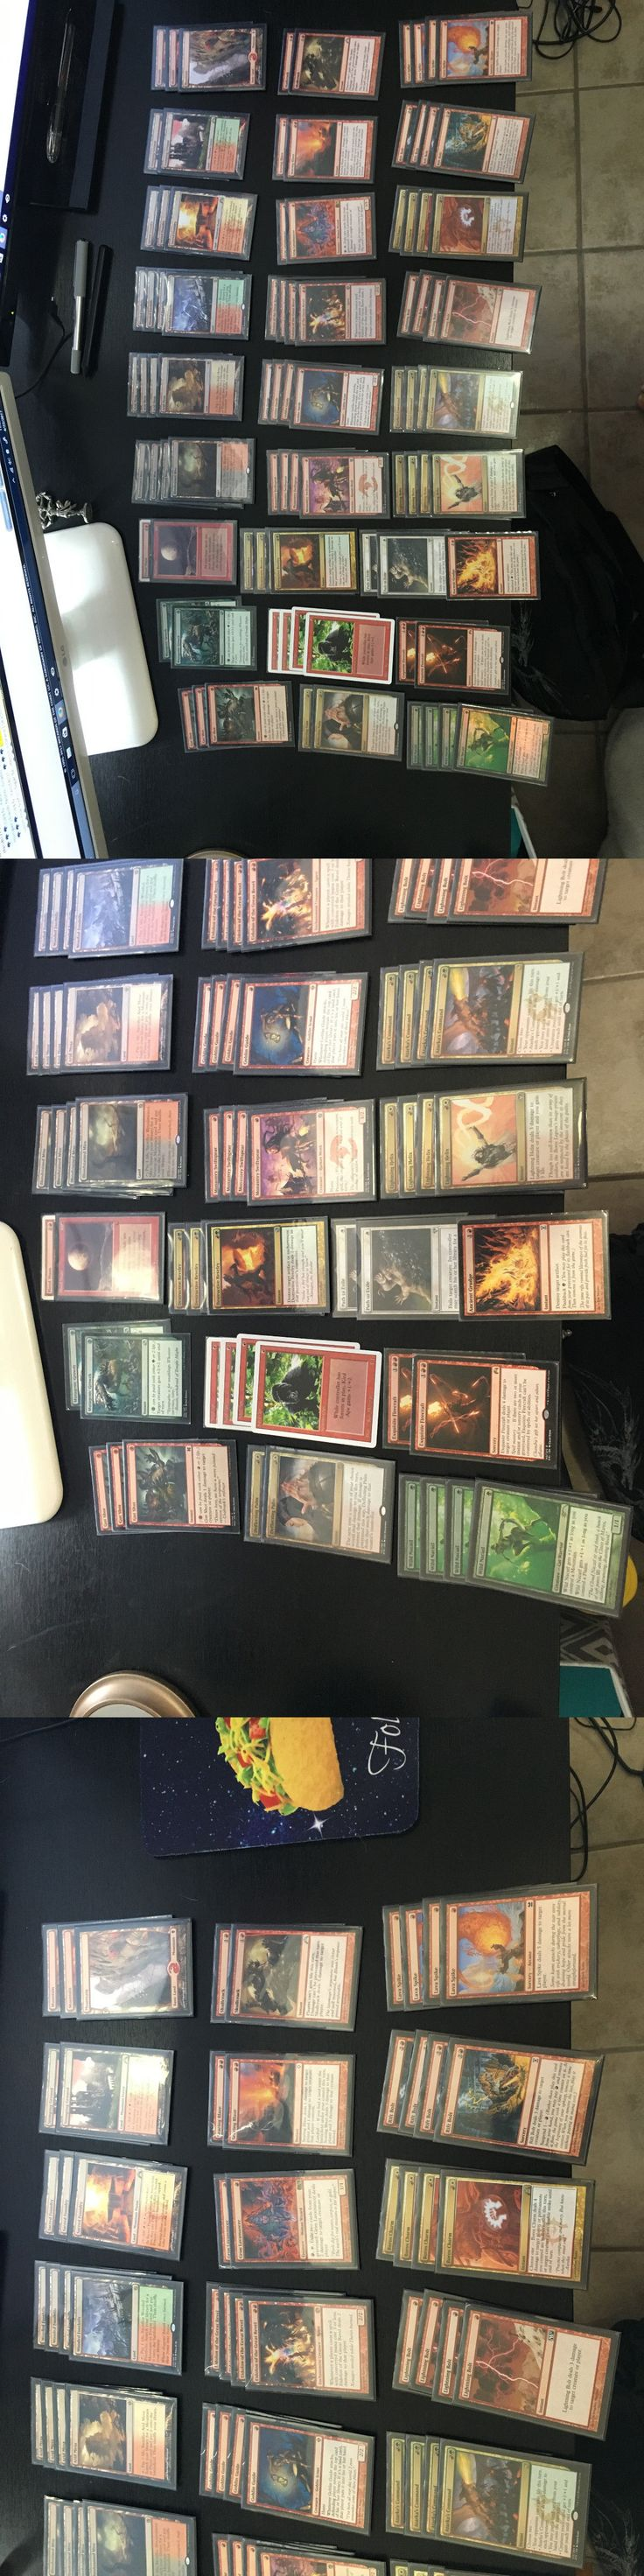 MTG Player-Built Decks 49196: Magic The Gathering Naya Burn Deck Mtg Modern Deck Magic Starter Deck Tier 1 -> BUY IT NOW ONLY: $500 on eBay!